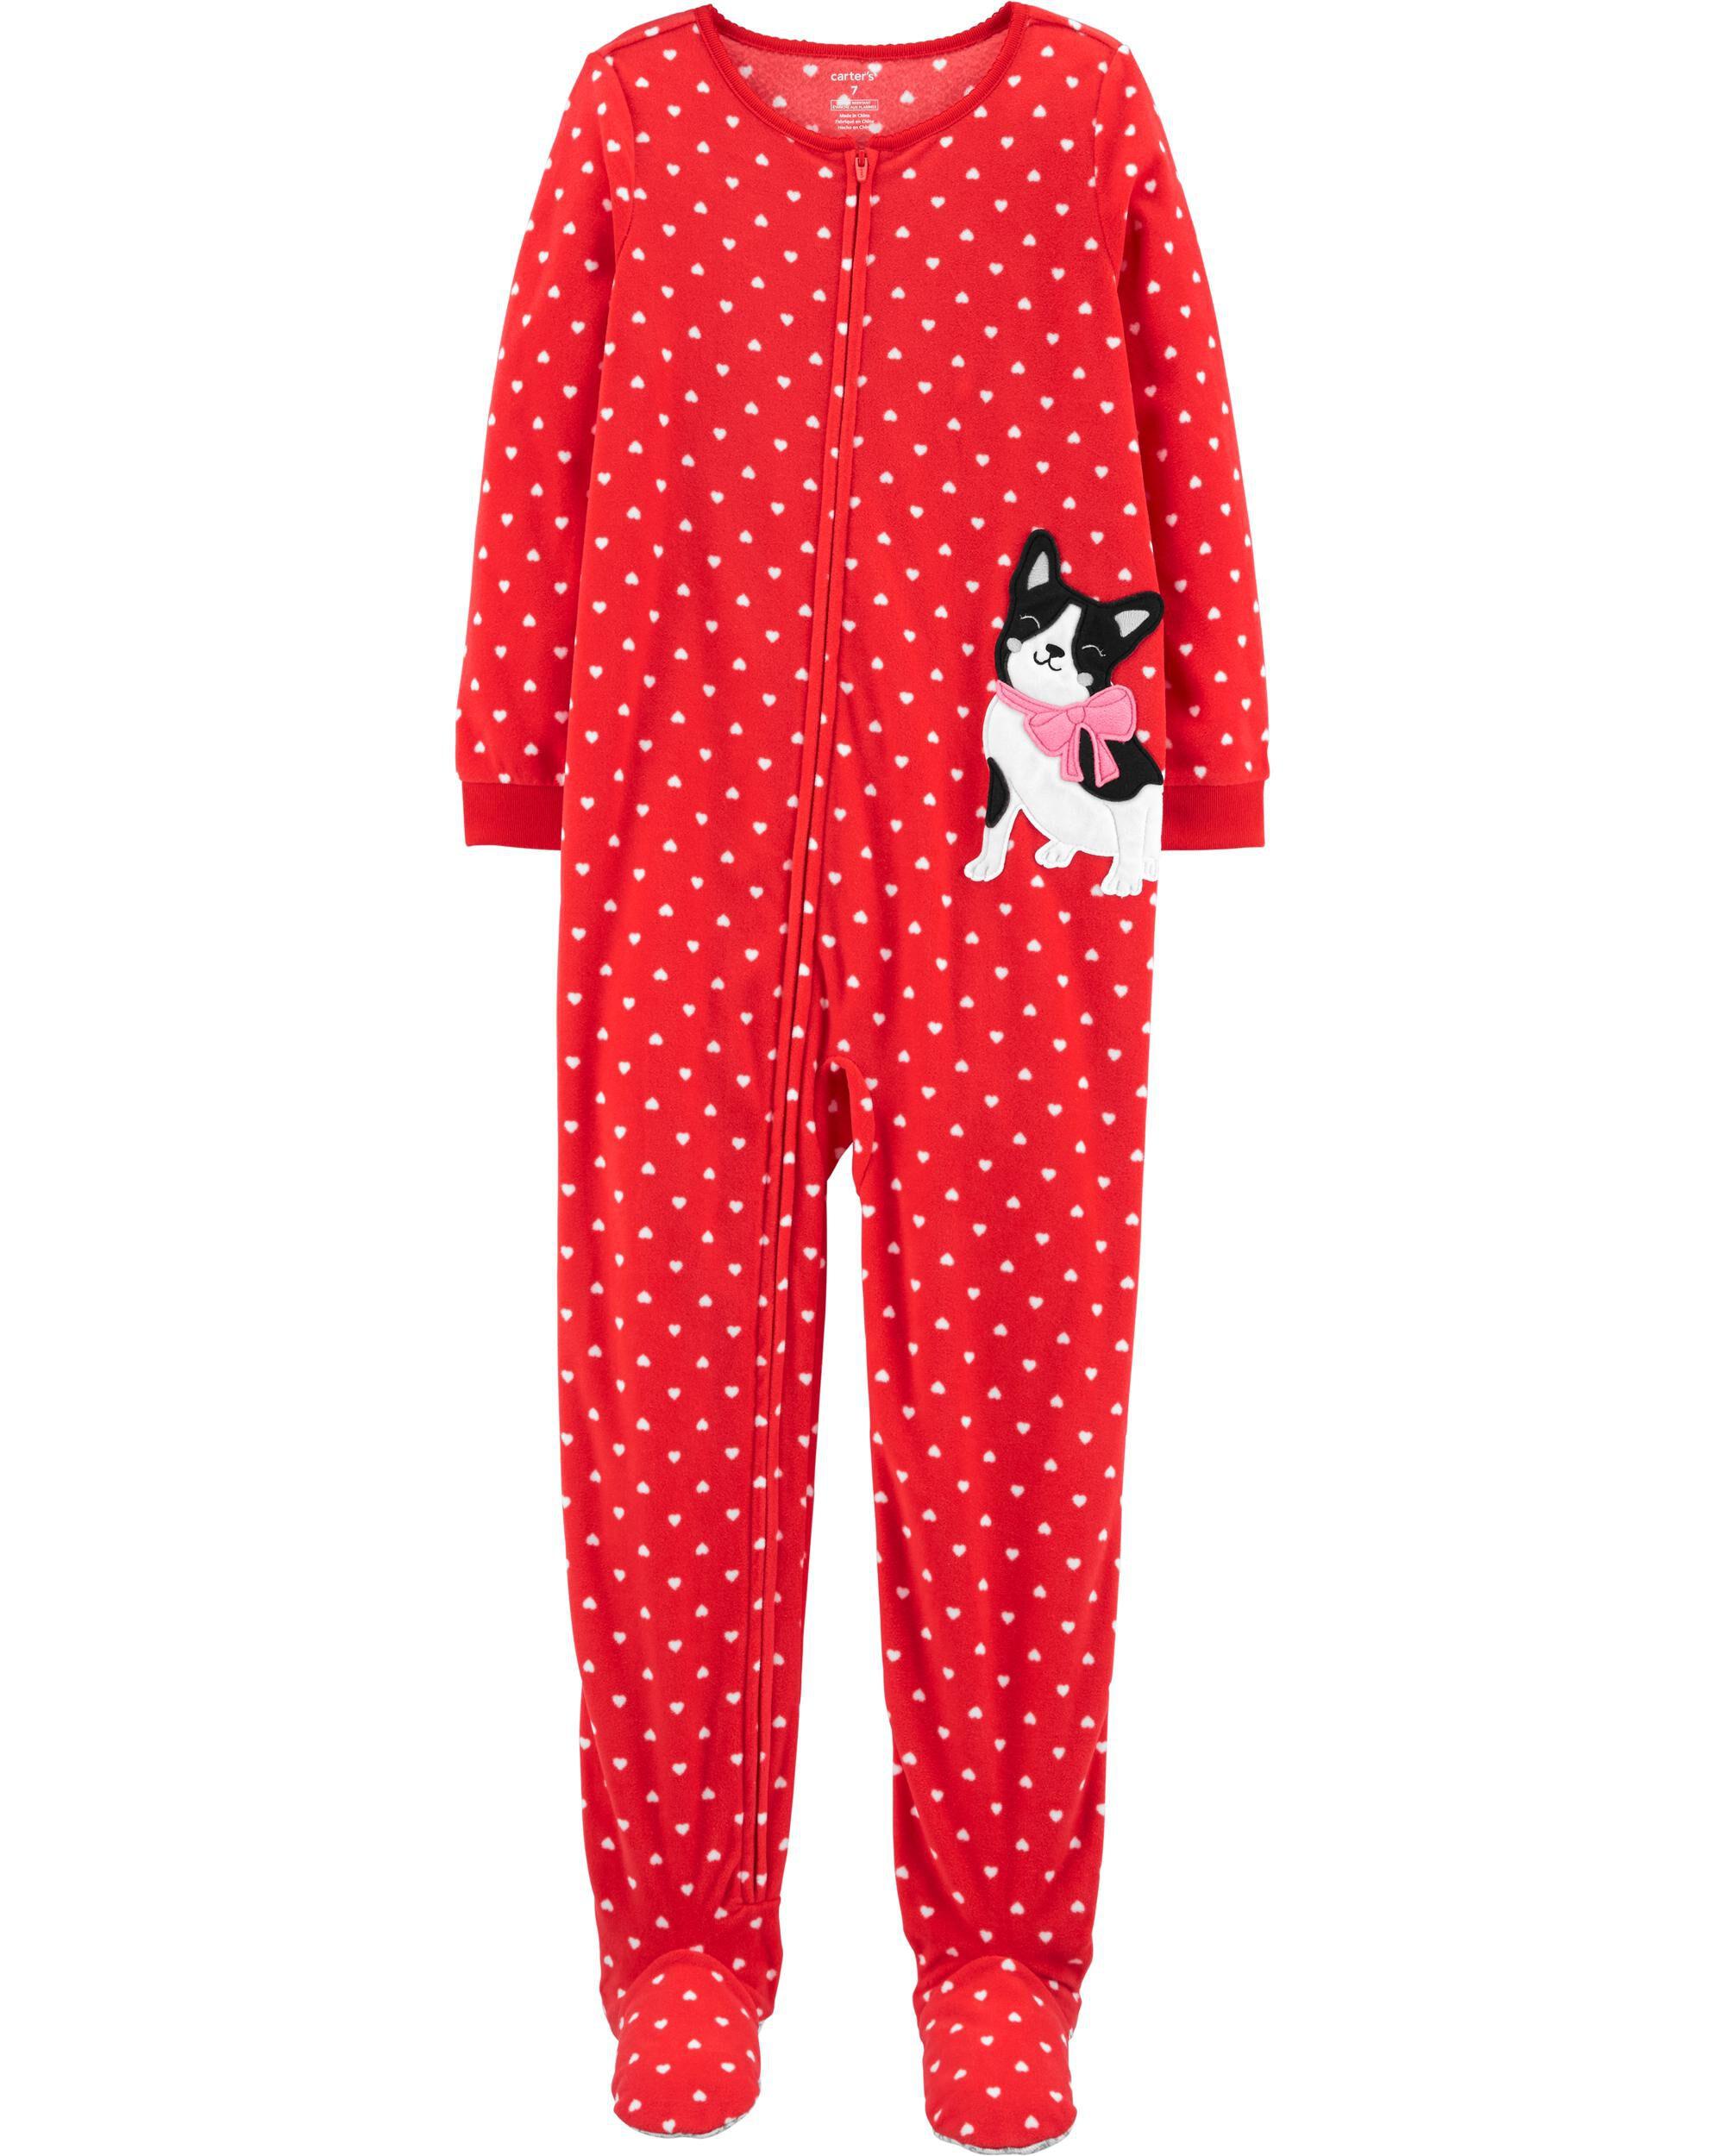 *CLEARANCE* 1-Piece French Bulldog Fleece Footie PJs